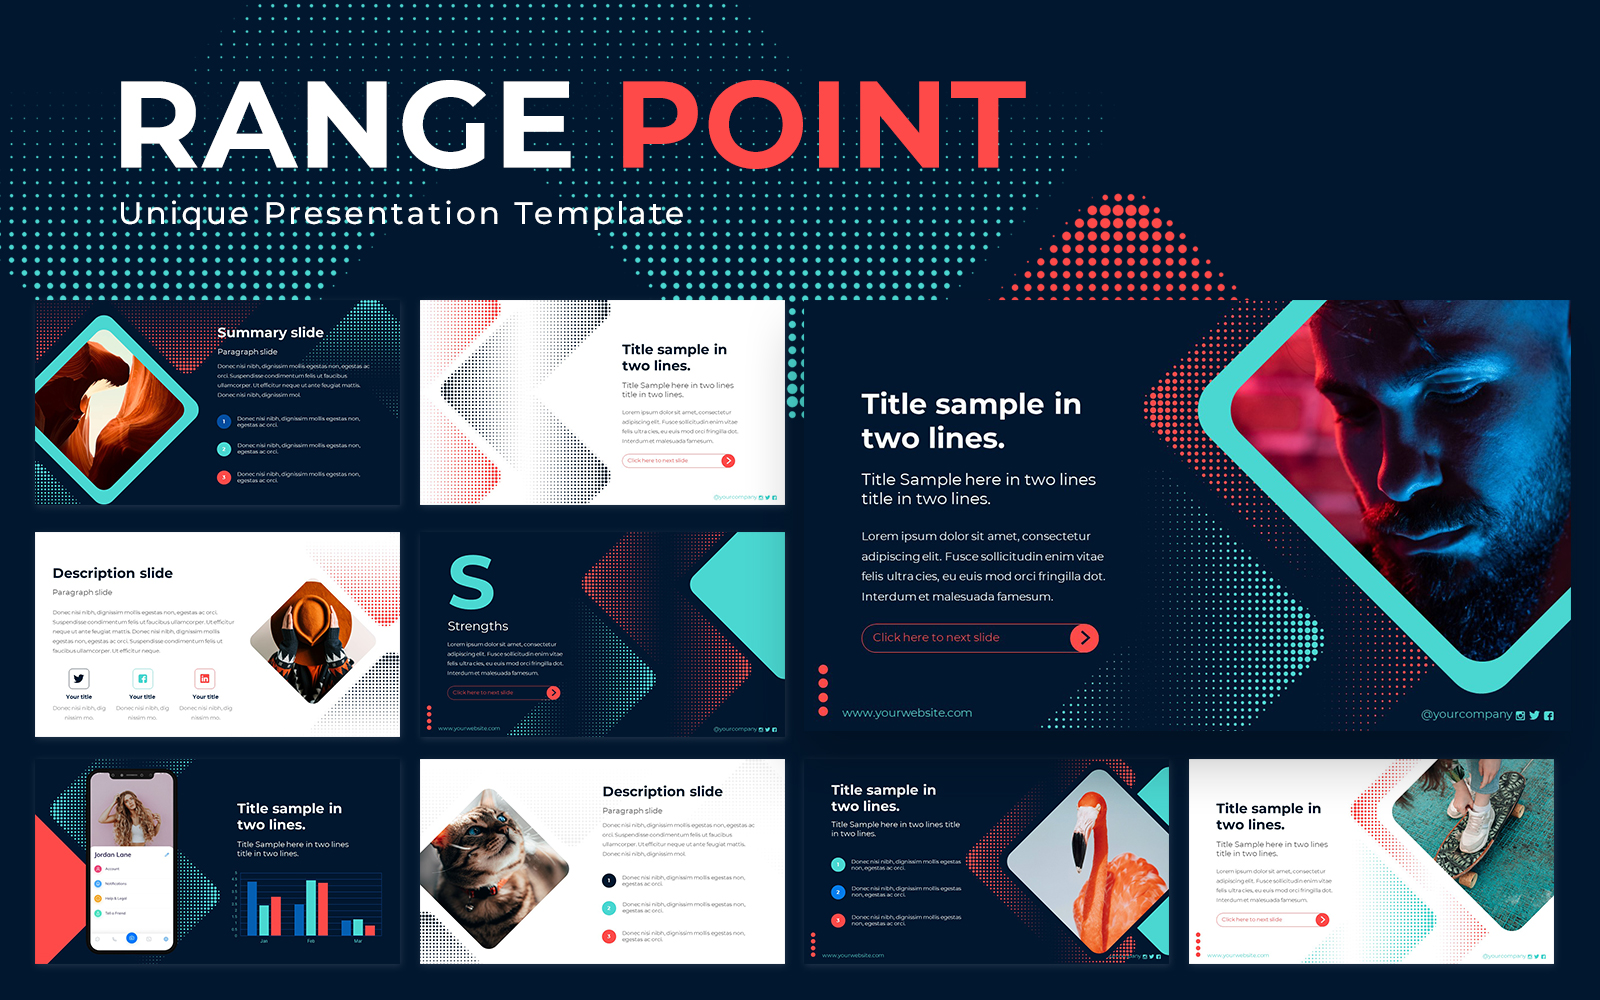 Range Point Powerpoint Presentation Template